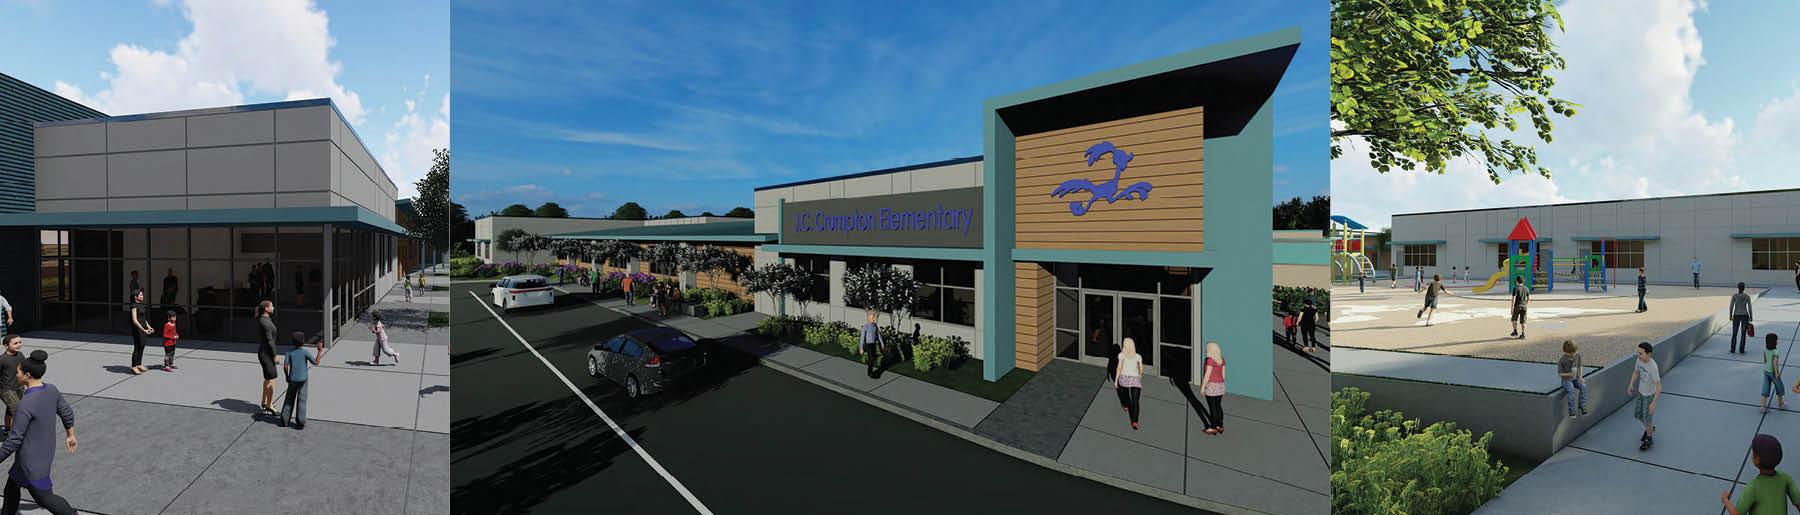 PROJECT UPDATE: Crumpton Elementary School Modernization